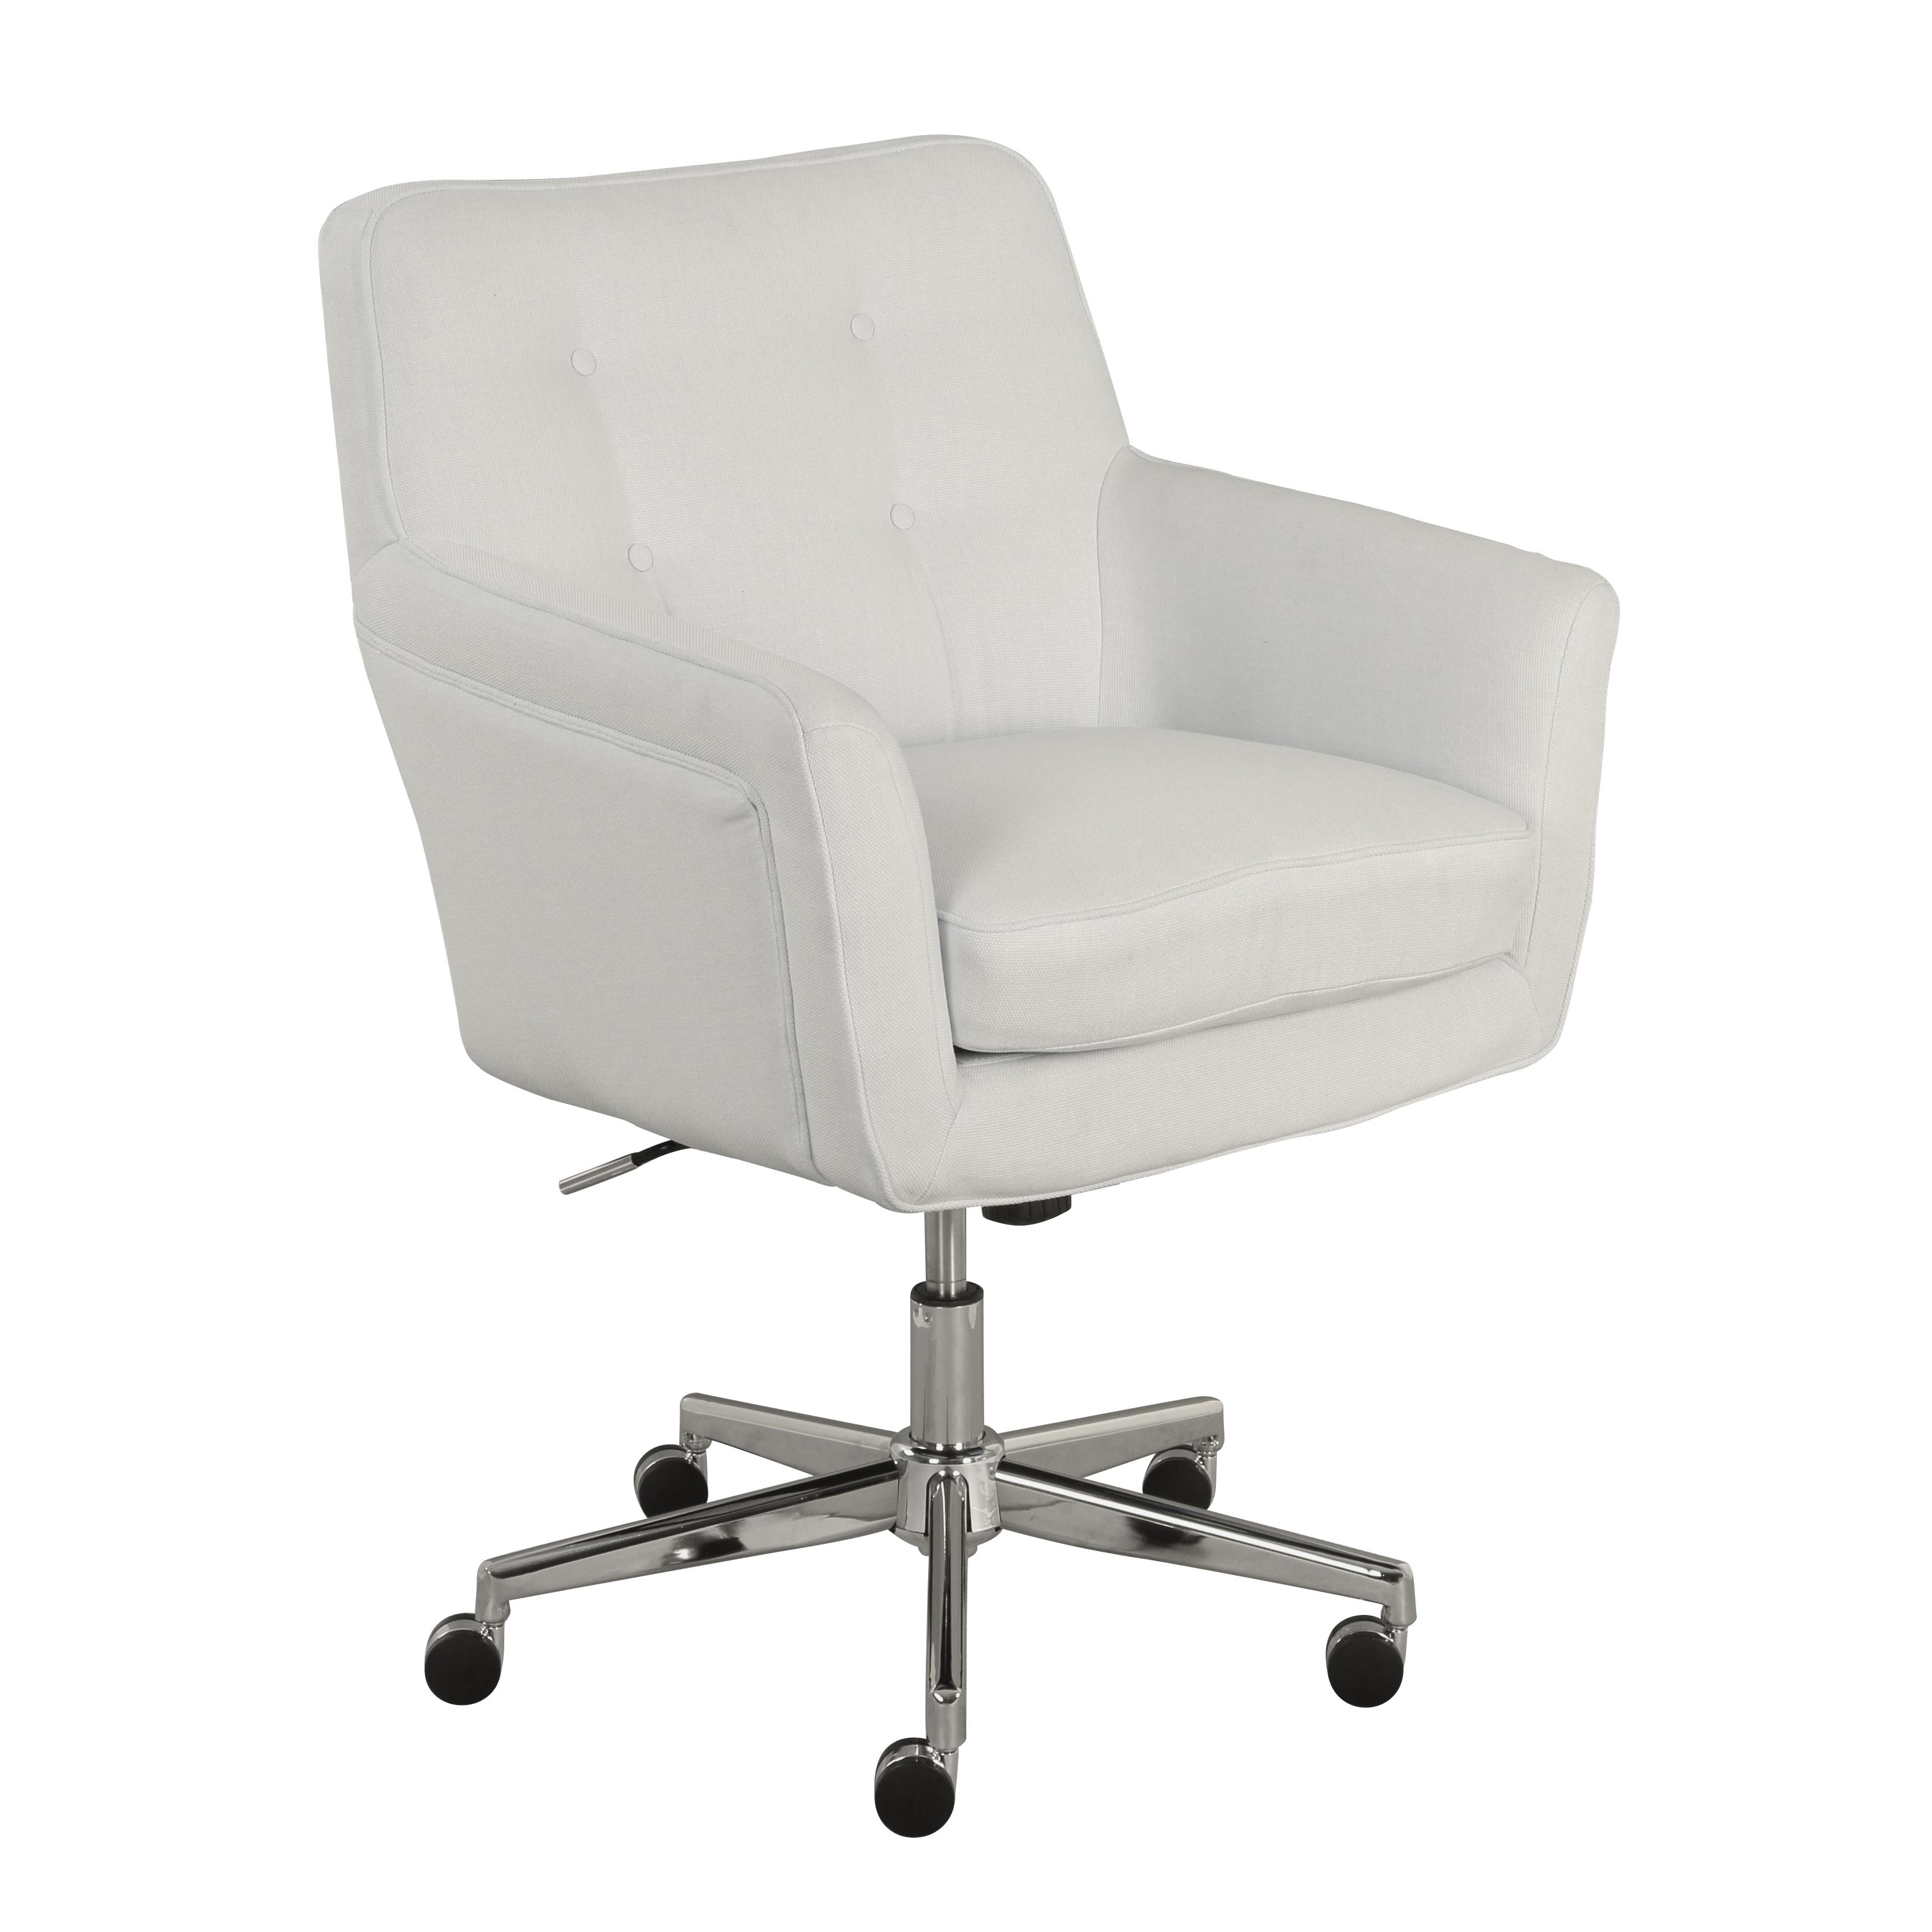 off white office chair. Serta Ashland Ivory Home Office Chair (Option: Off-White) Off White I